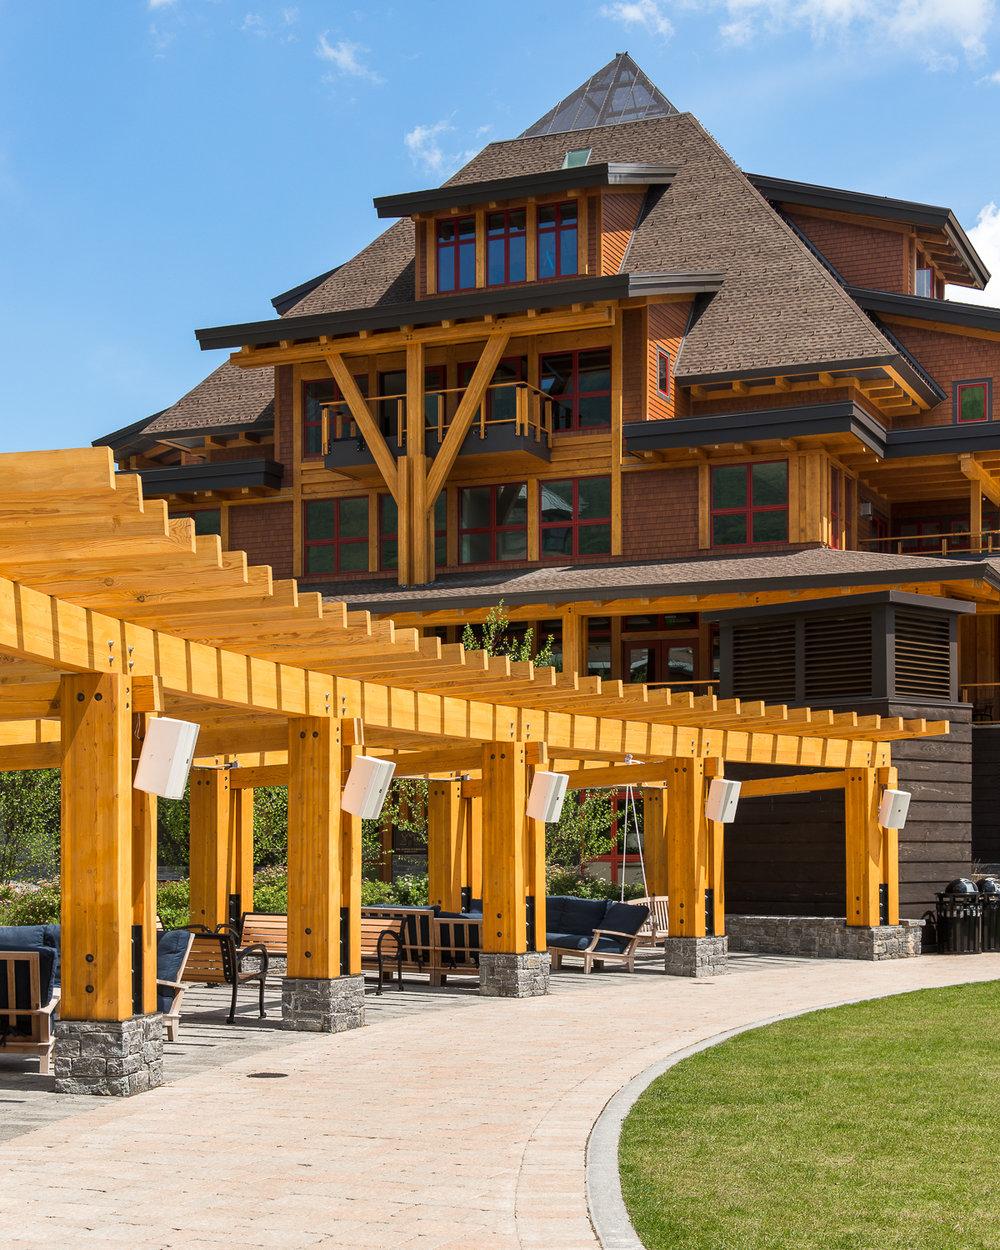 Stowe: Spruce Peak Adventure Center